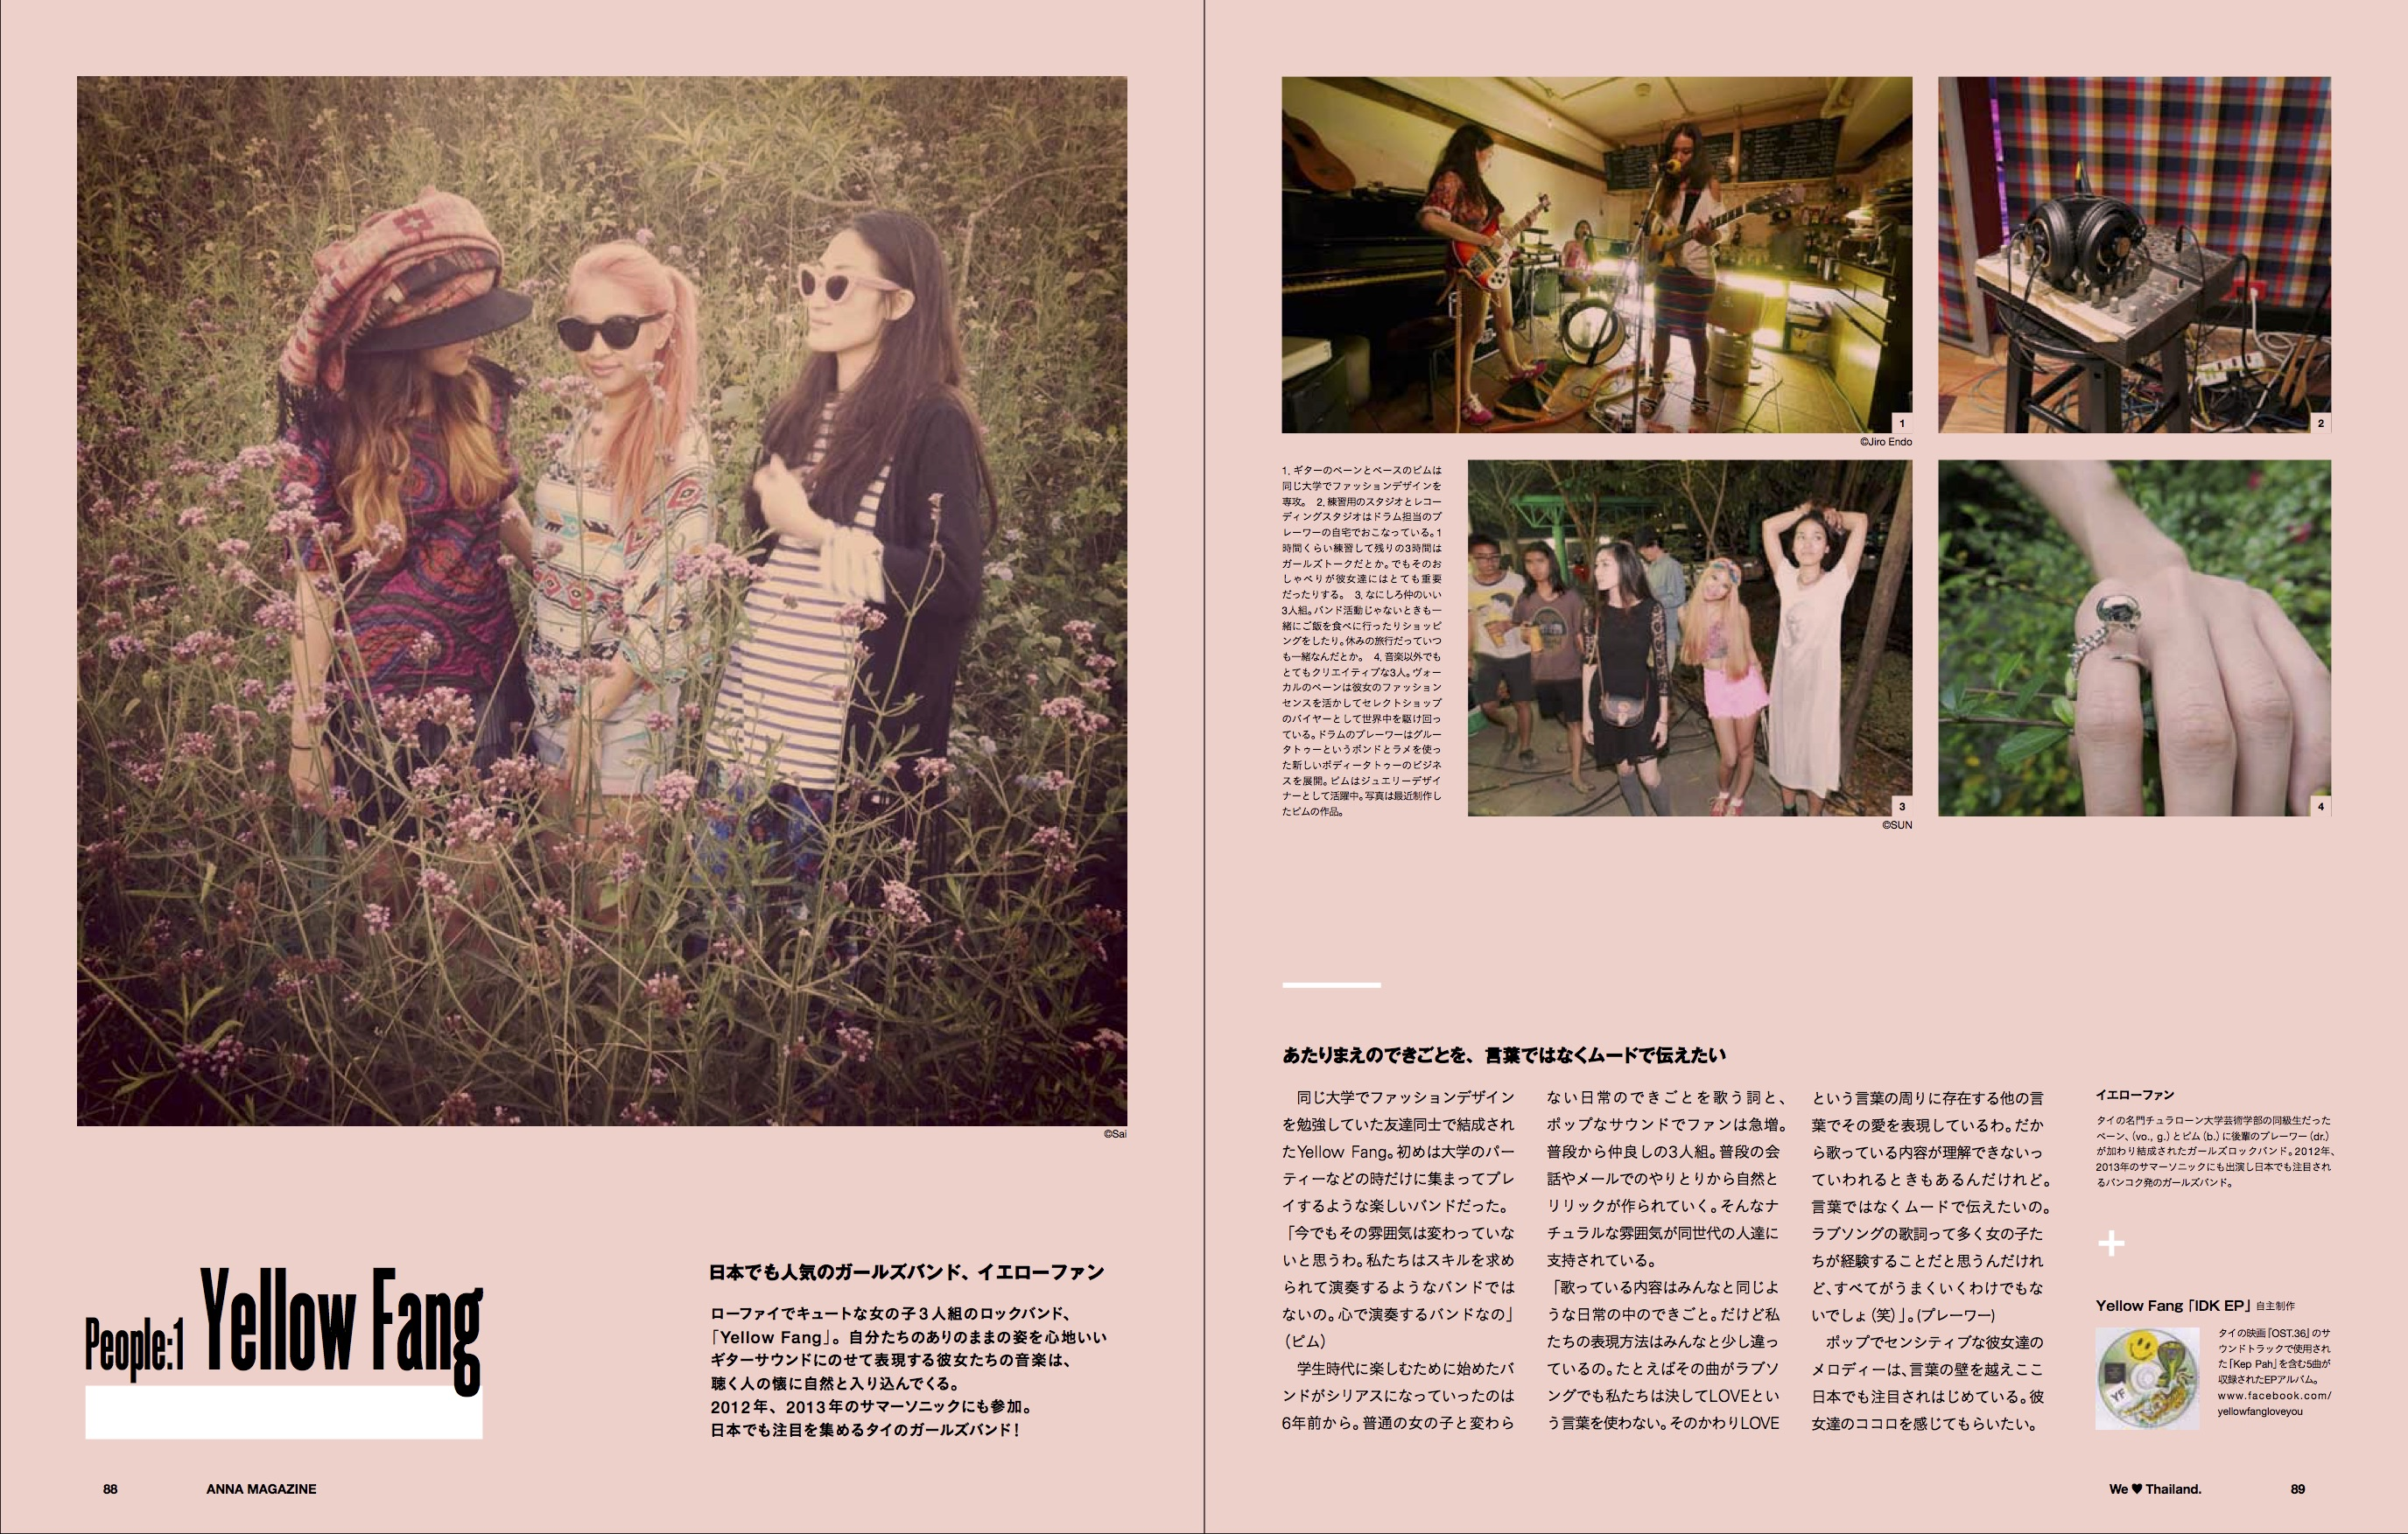 anna magazine Vol.1 P44